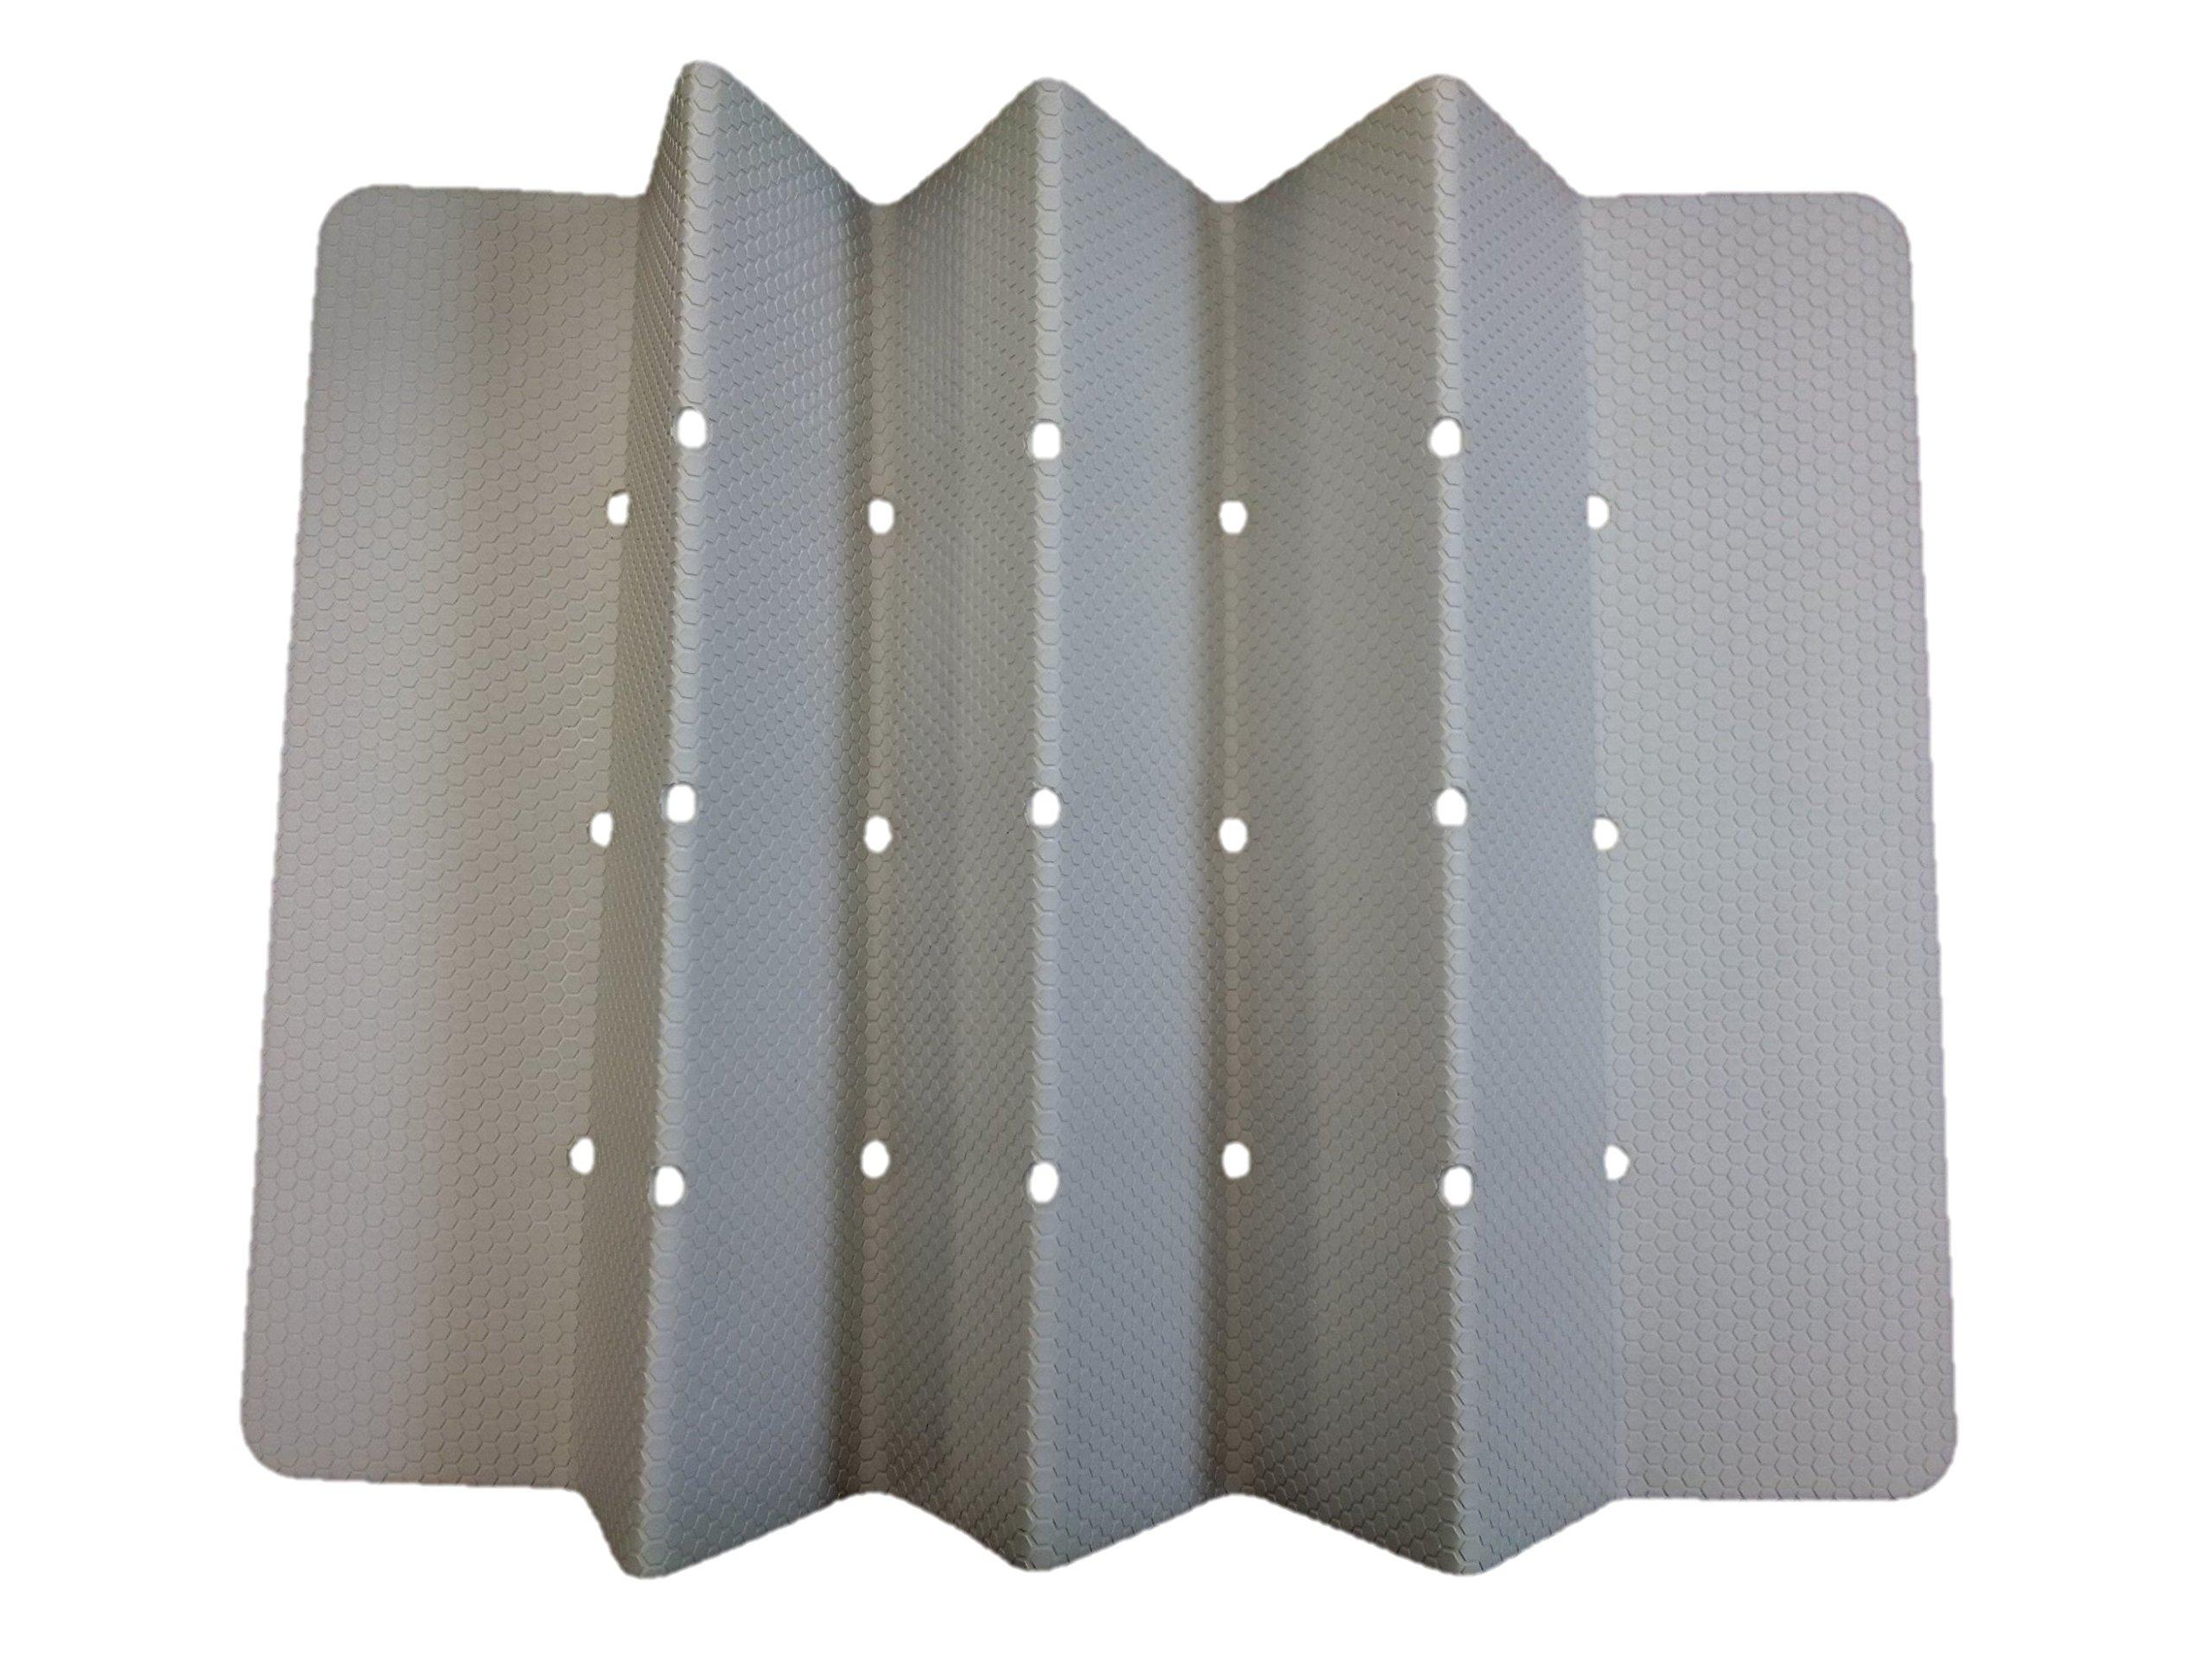 Sultan S Linens Foldable Non Slip Rubber Bath Mat